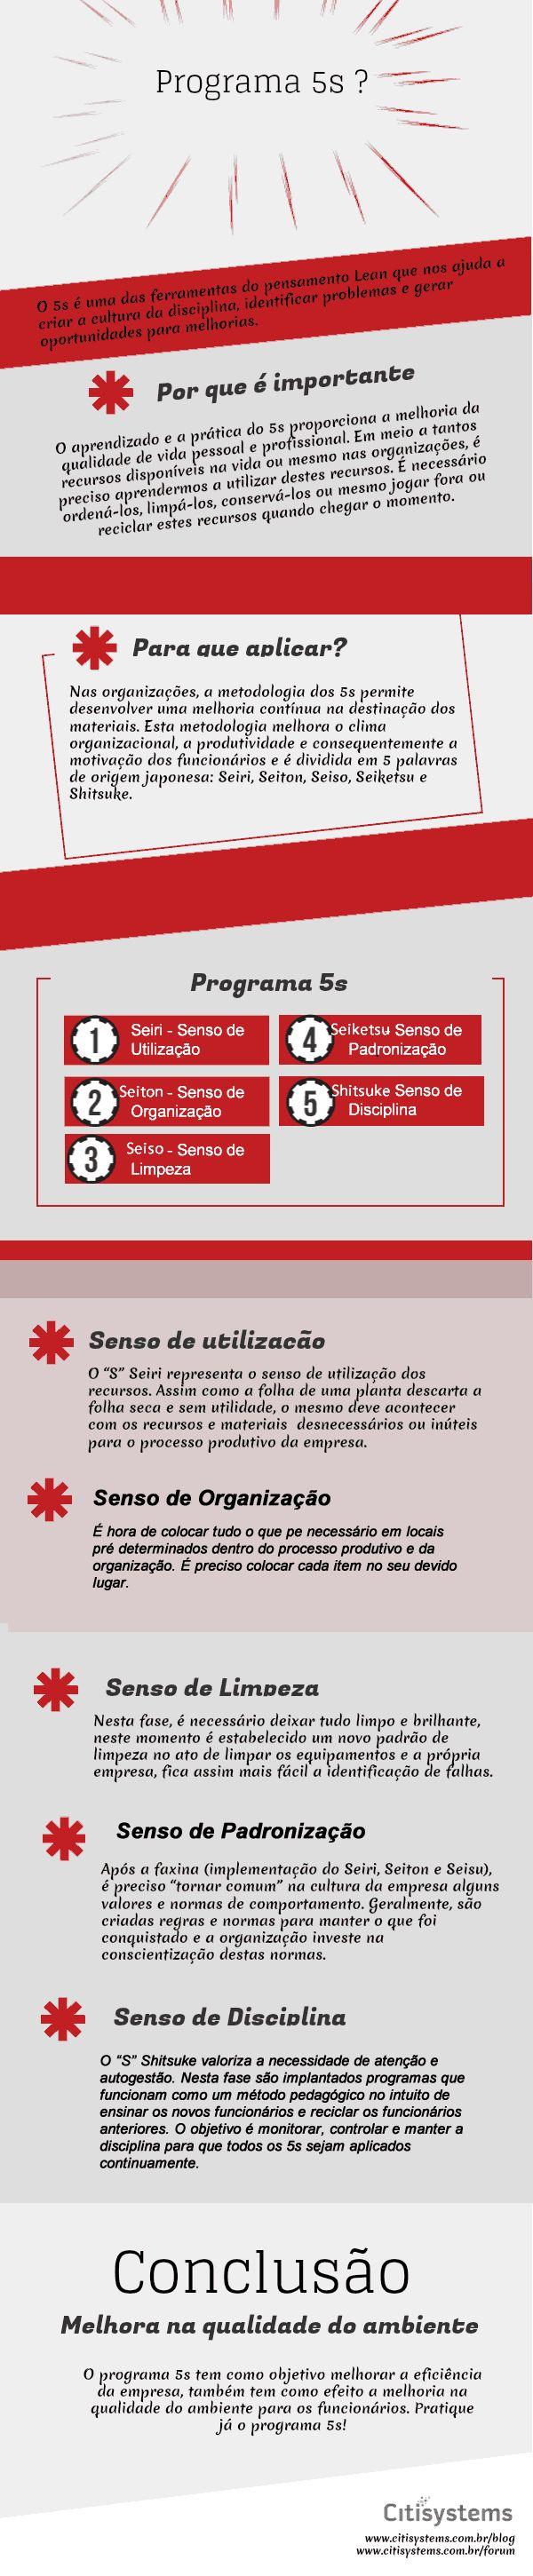 programa 5s infográfico